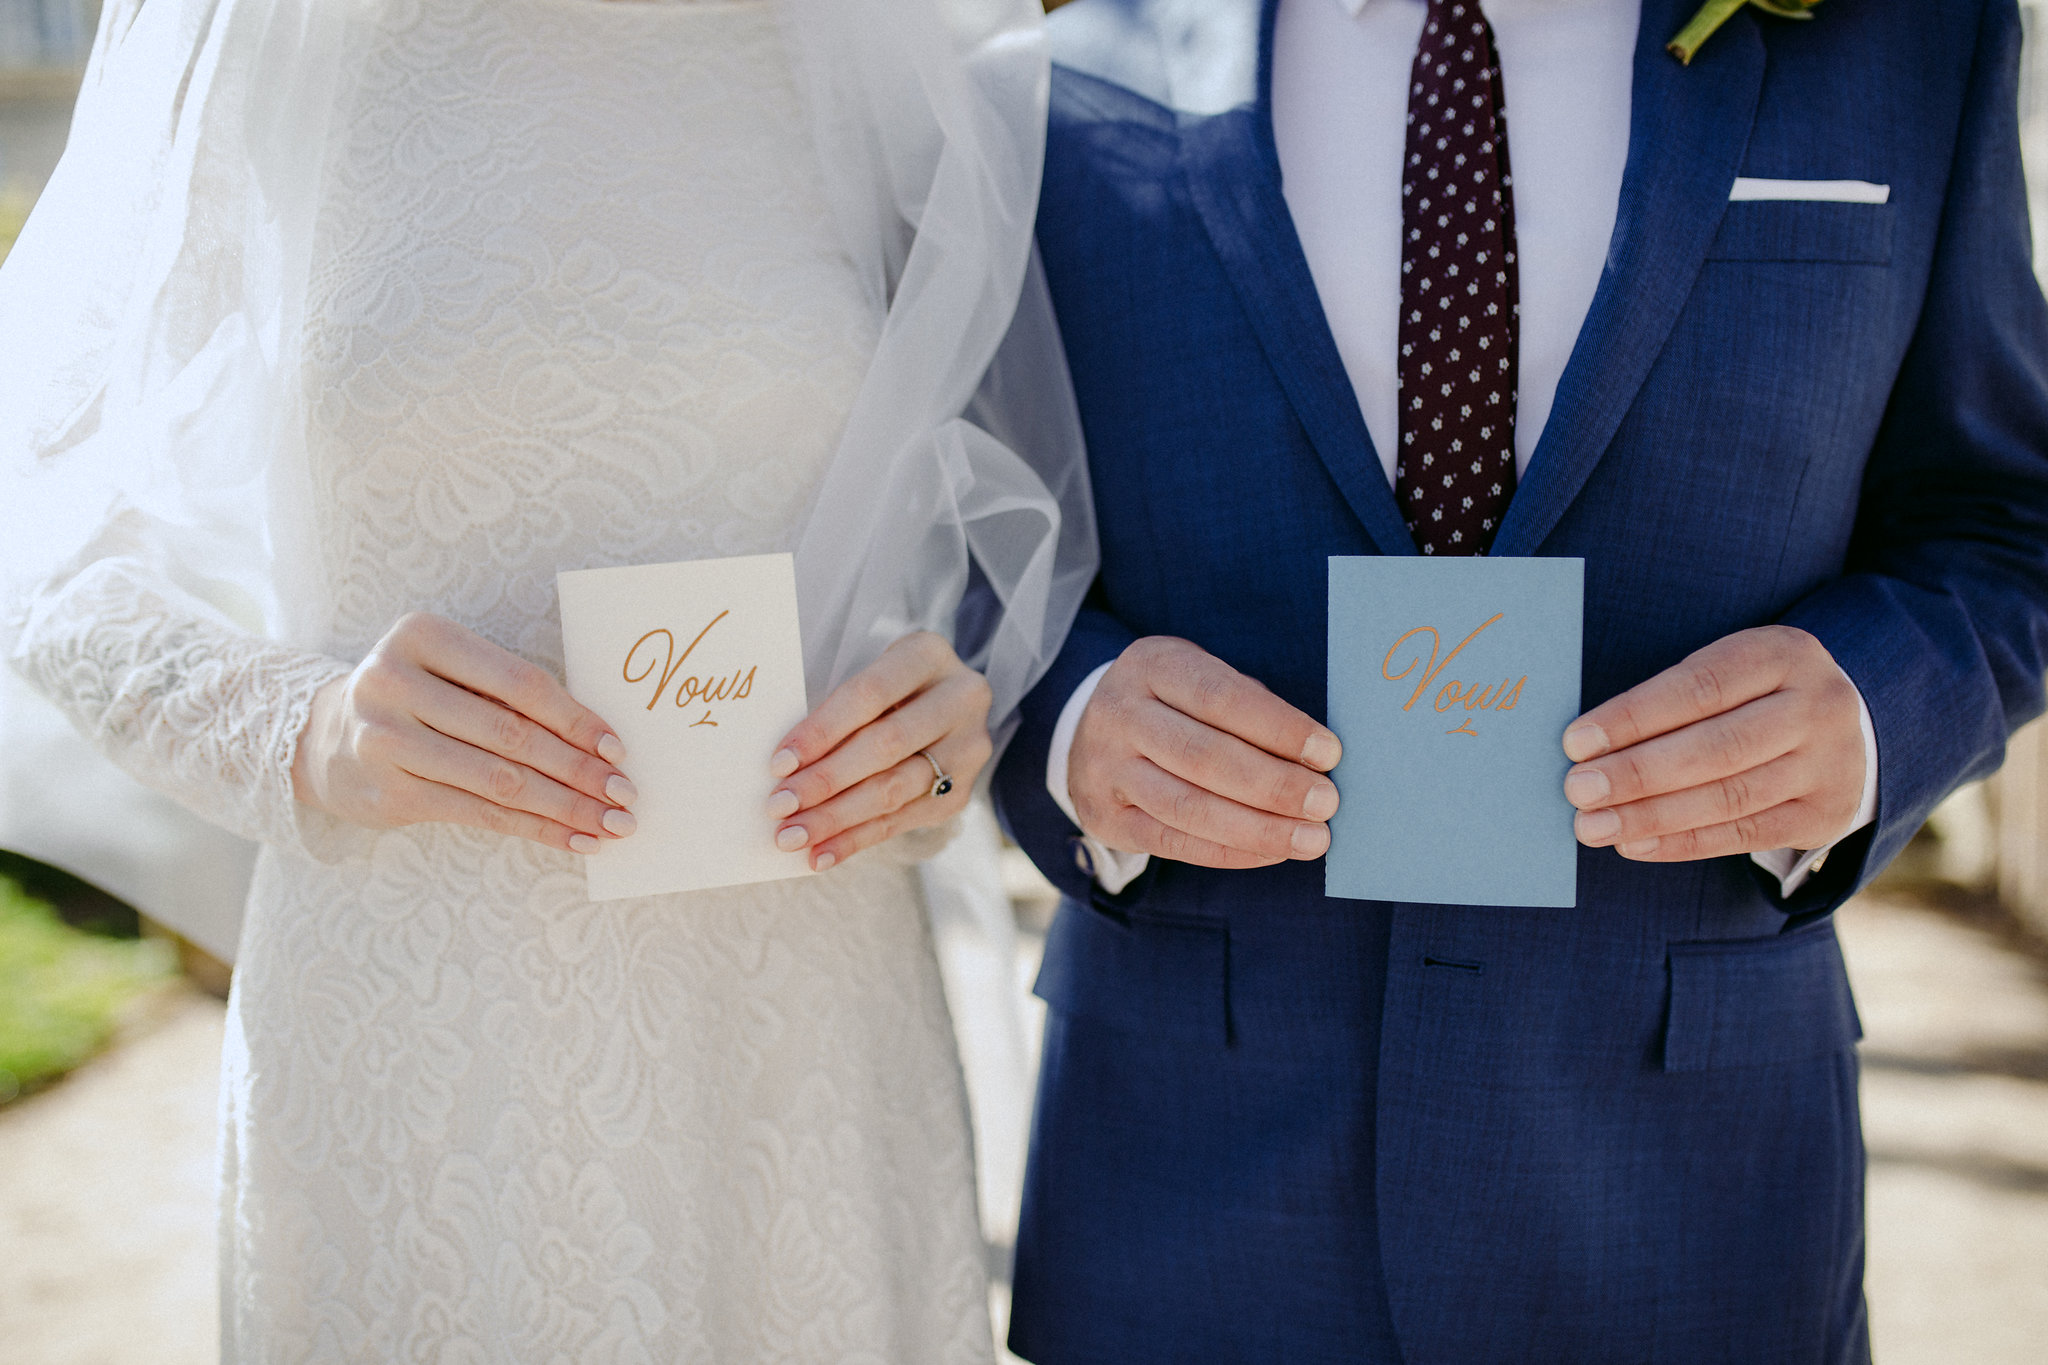 Paris_elopement_wedding_photographer-149.jpg